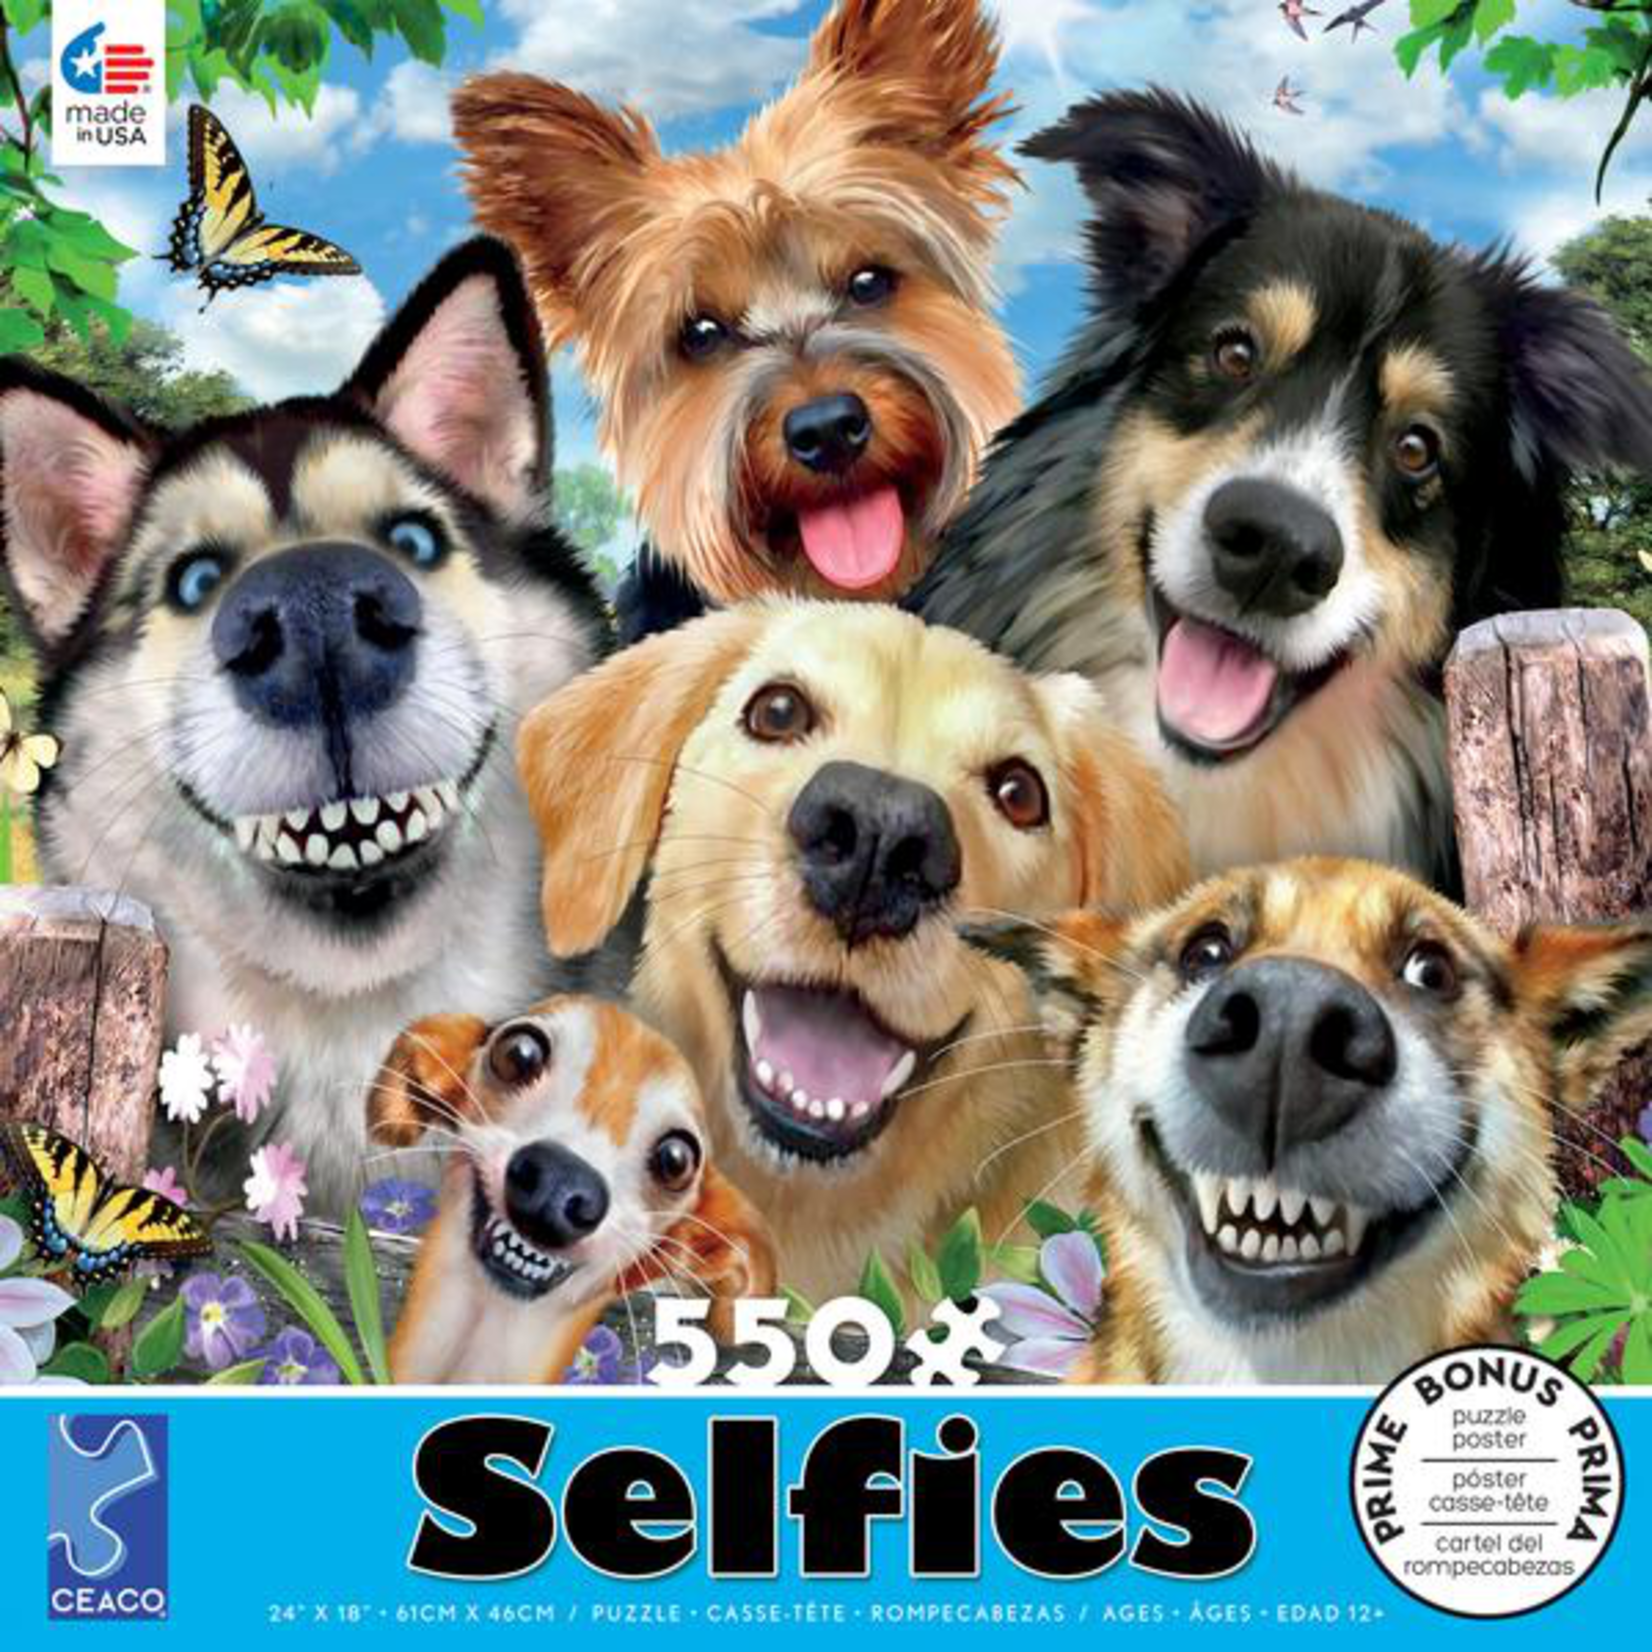 CEACO Dog Delight Selfies 550pc